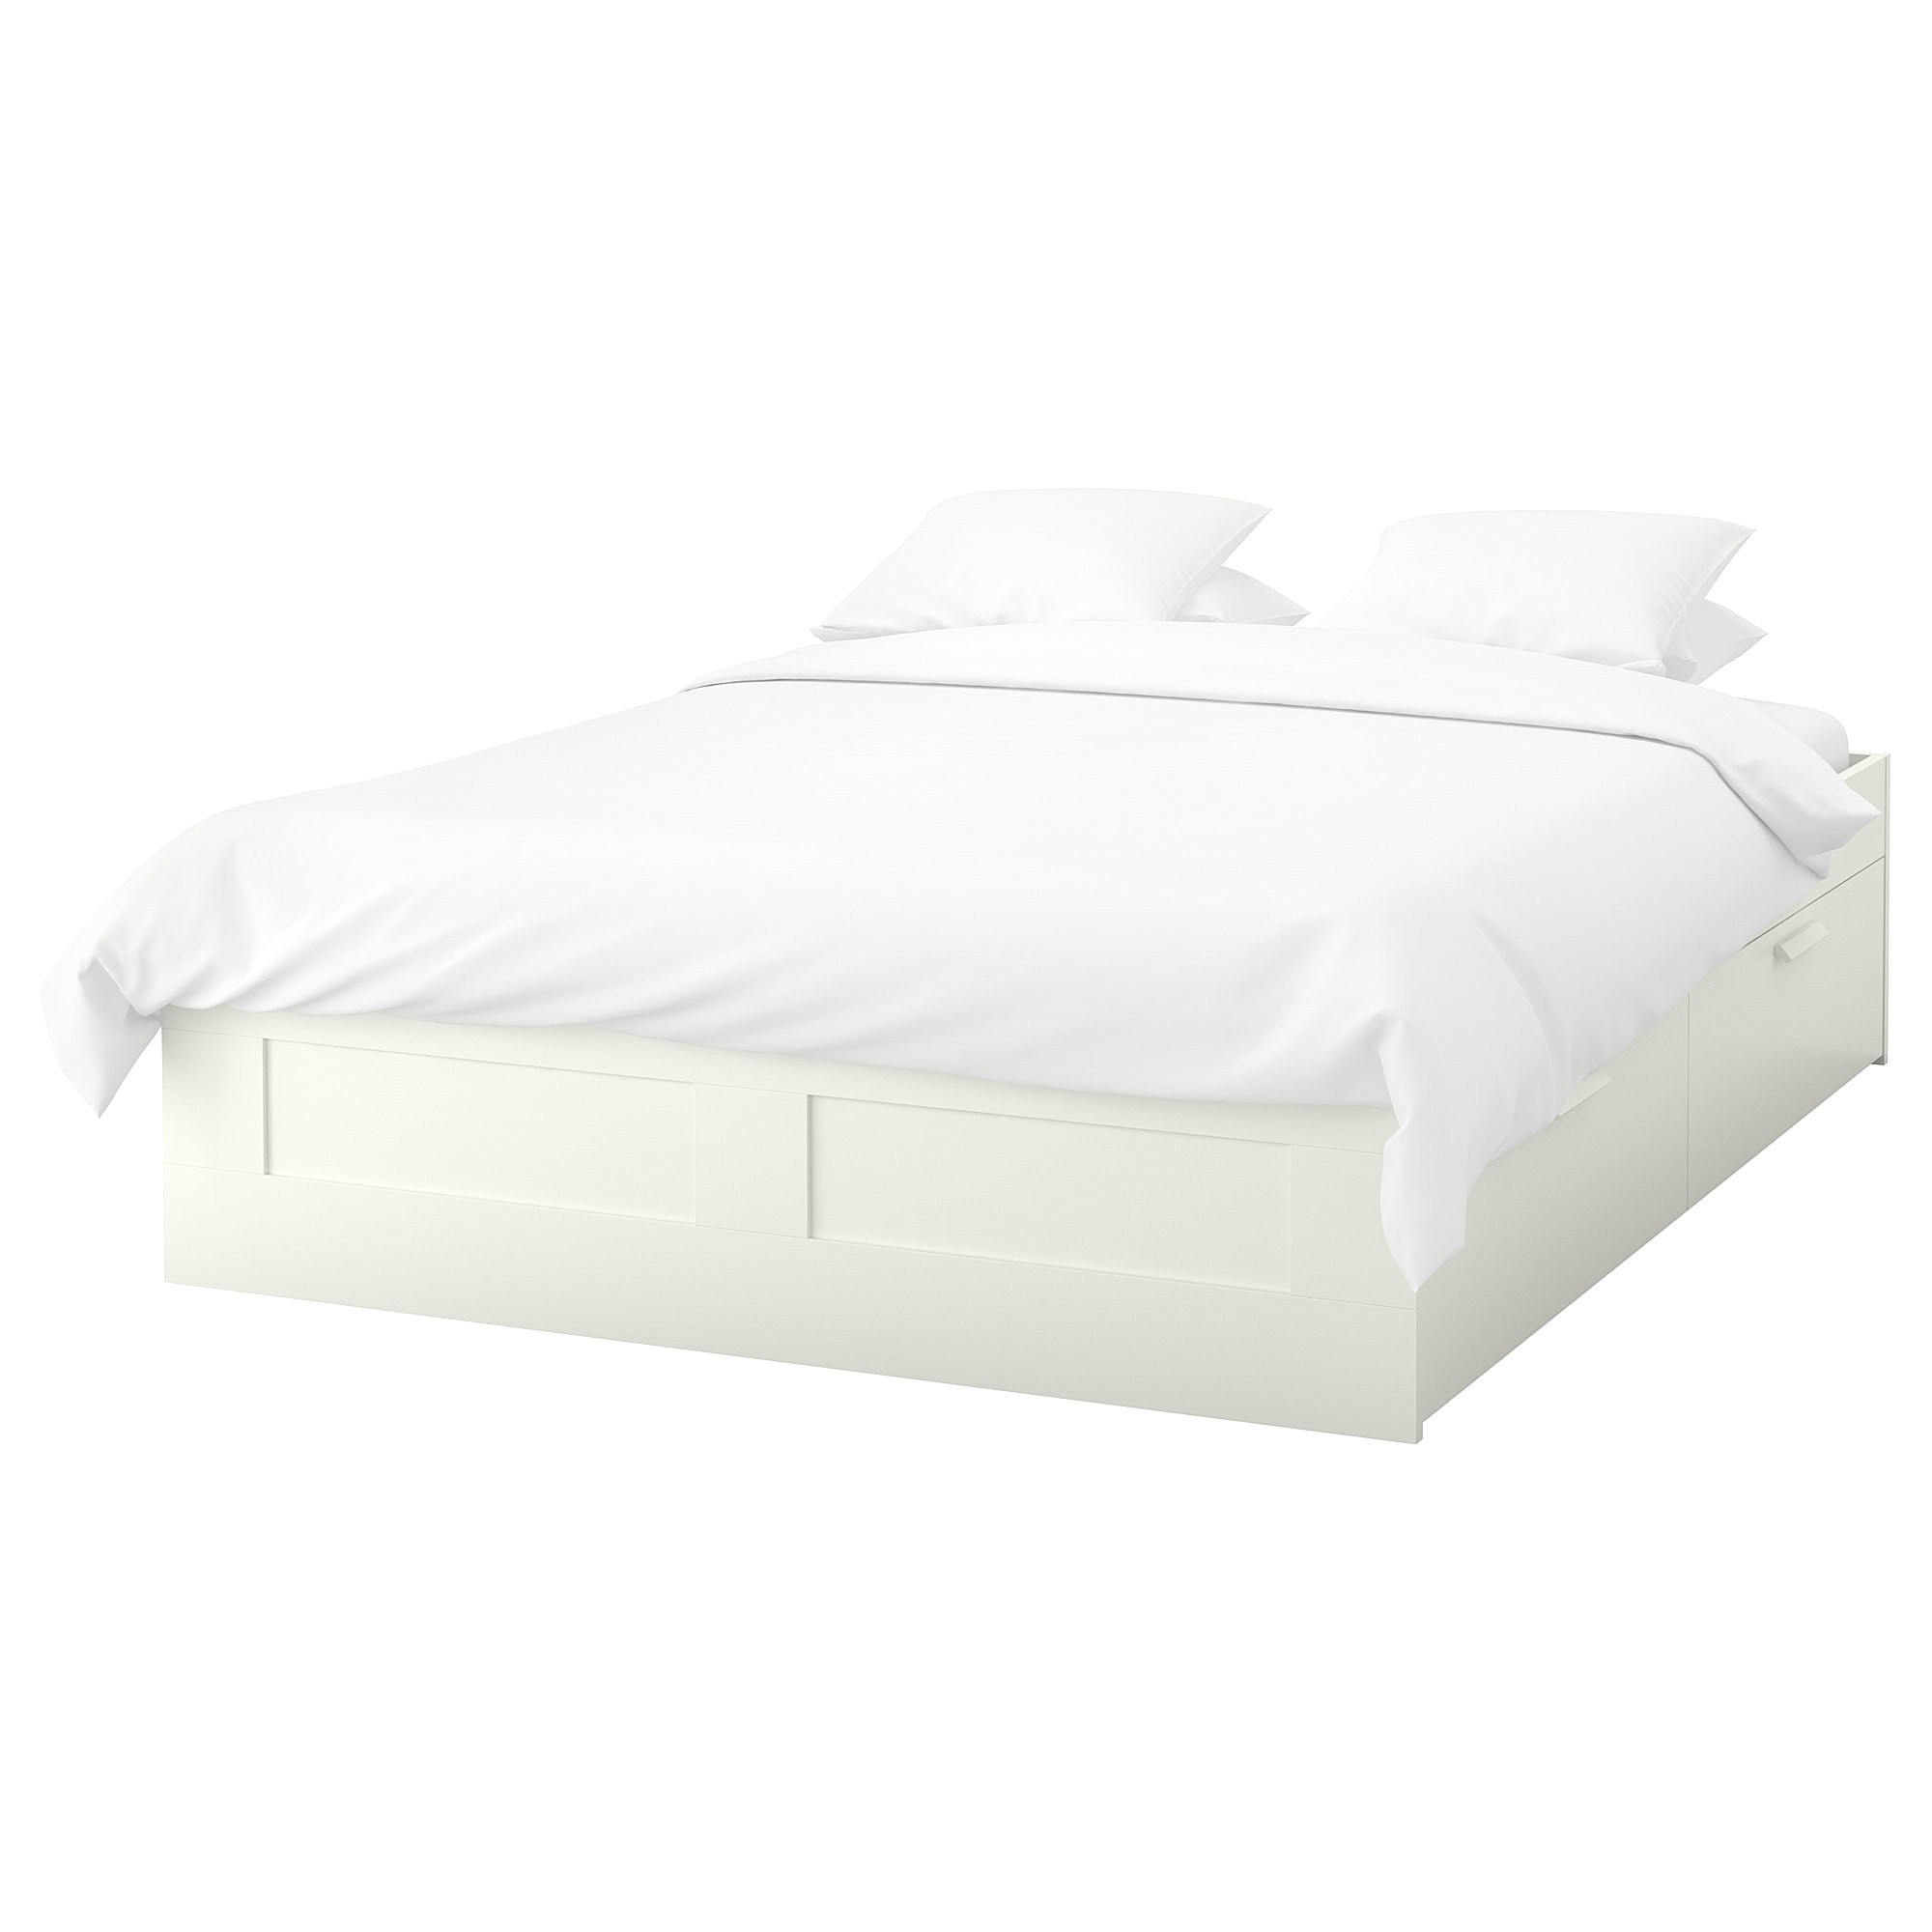 Brimnes Bed Frame with Storage Headboard Black Luröy King Size Bett 200×200 20 Photo King Size Bett 200×200 Kriyalea